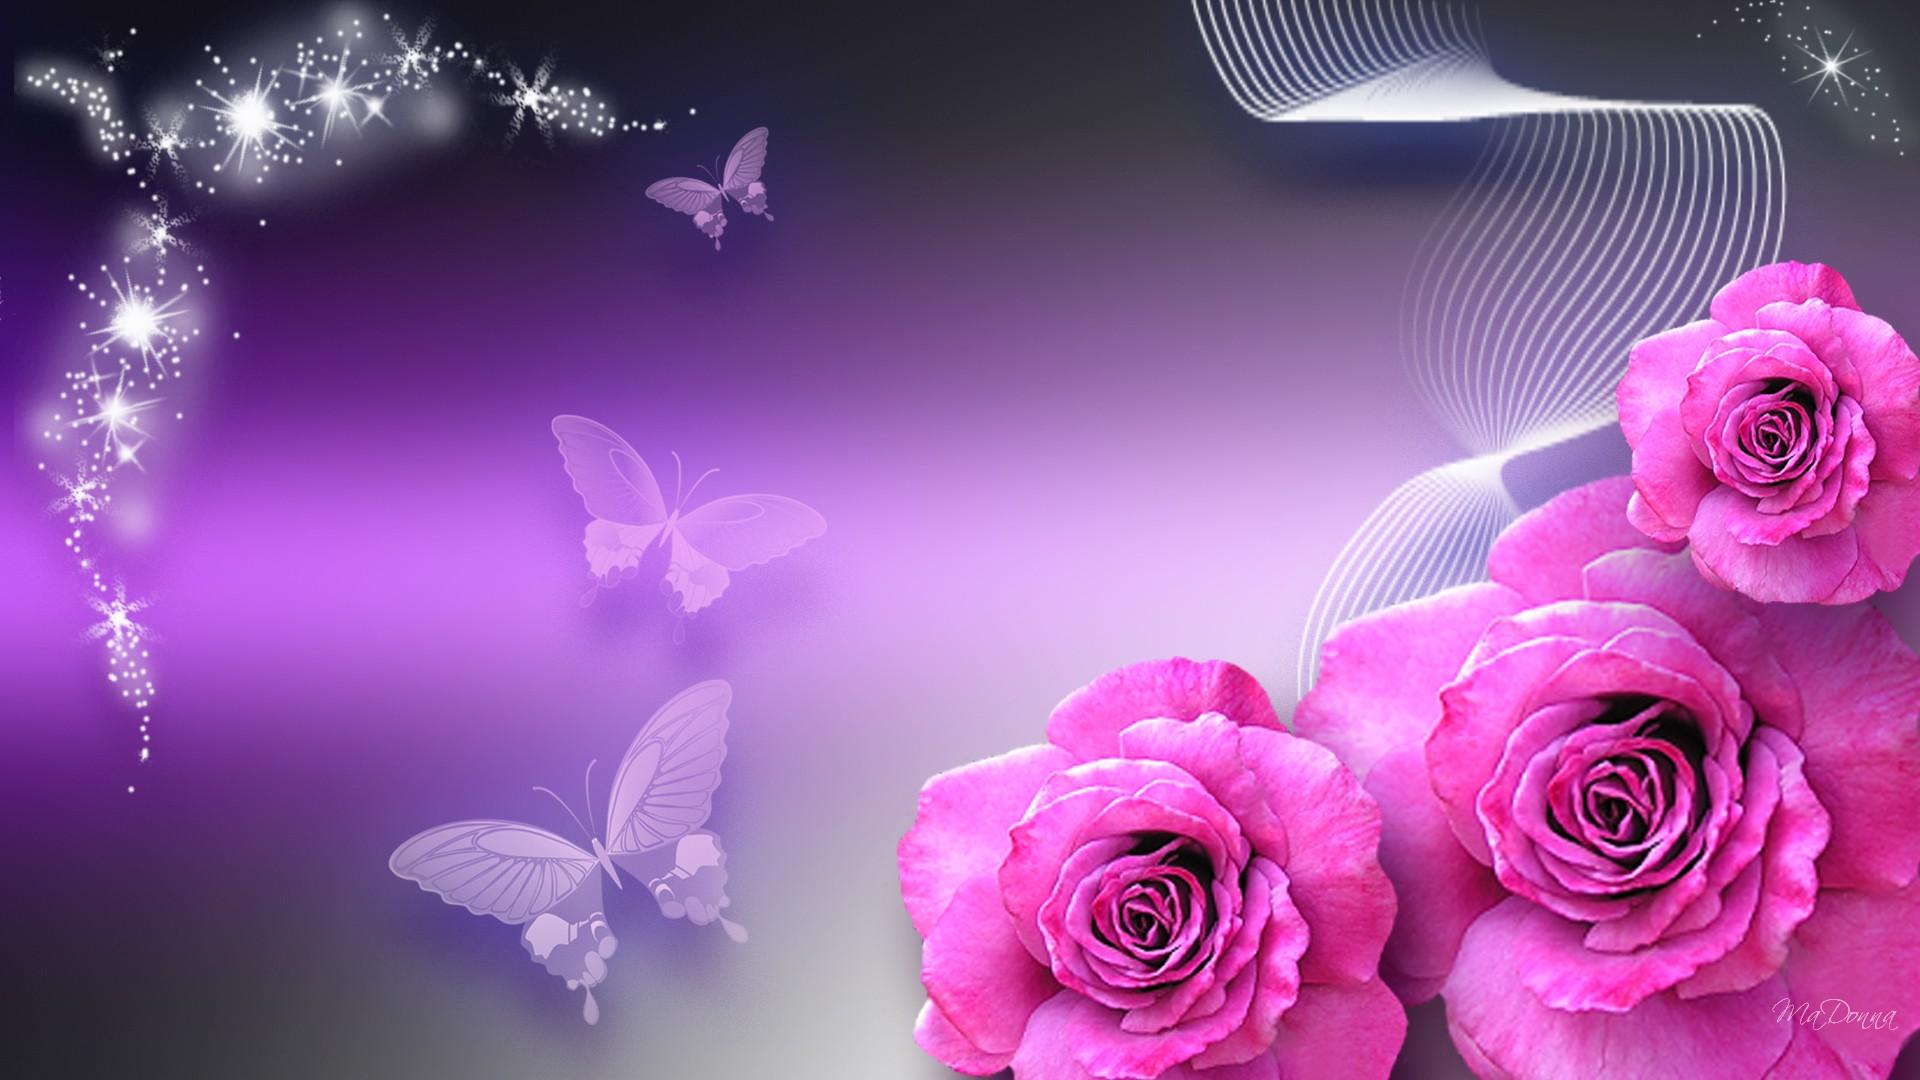 3D Wallpaper Hd Rose   1798224 1920x1080